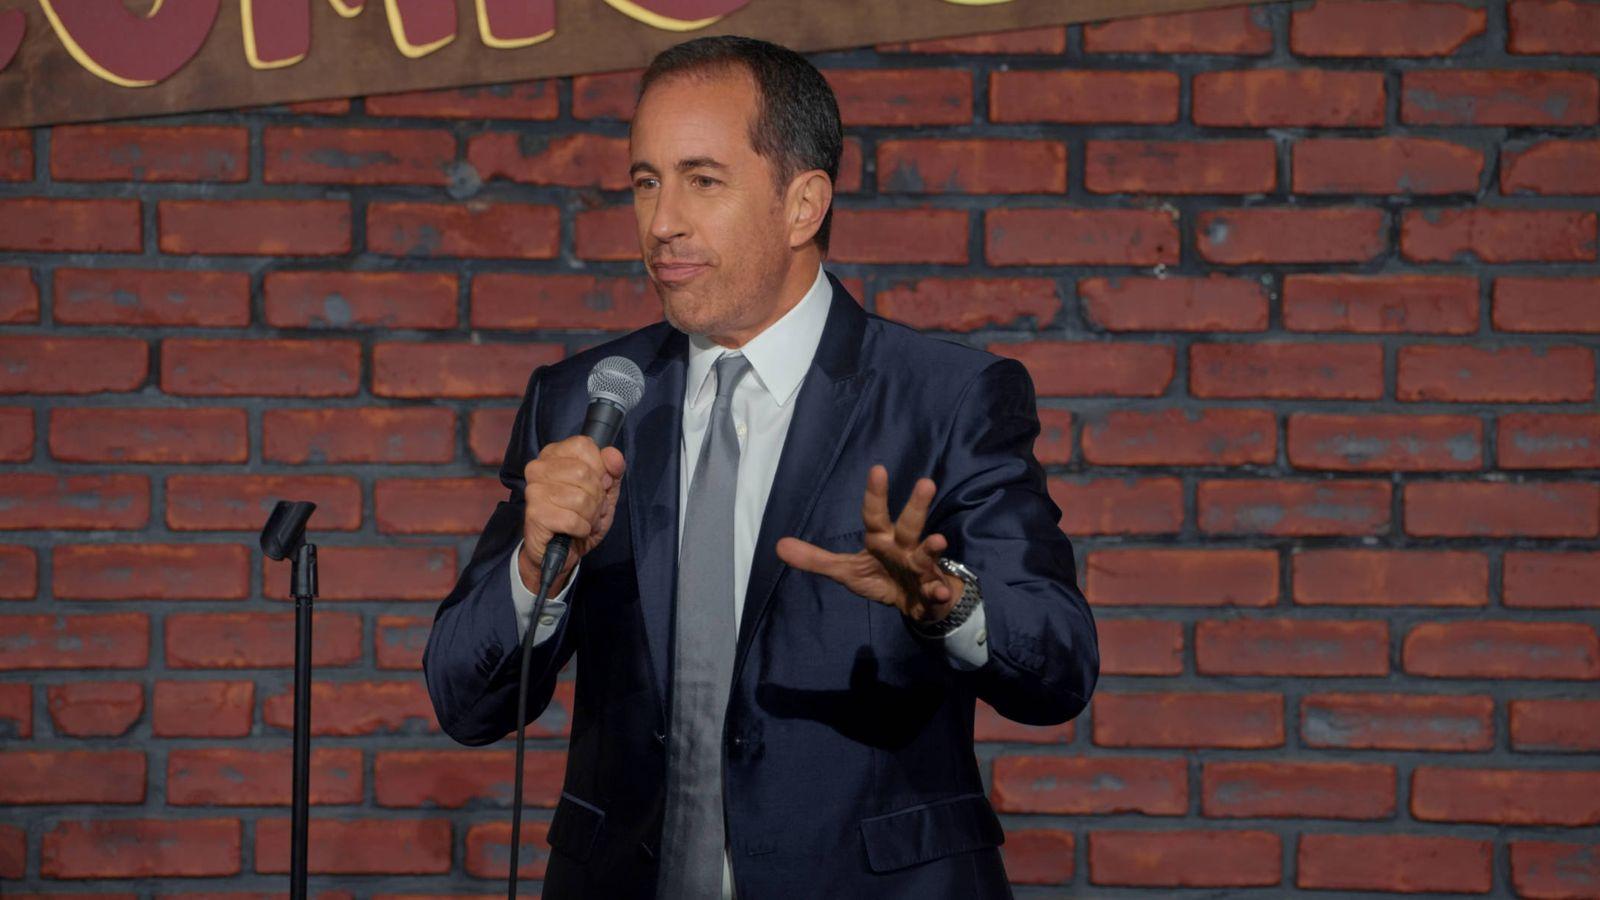 Foto: Jerry Seinfeld durante el monólogo 'Jerry before Seinfeld' (Netflix)